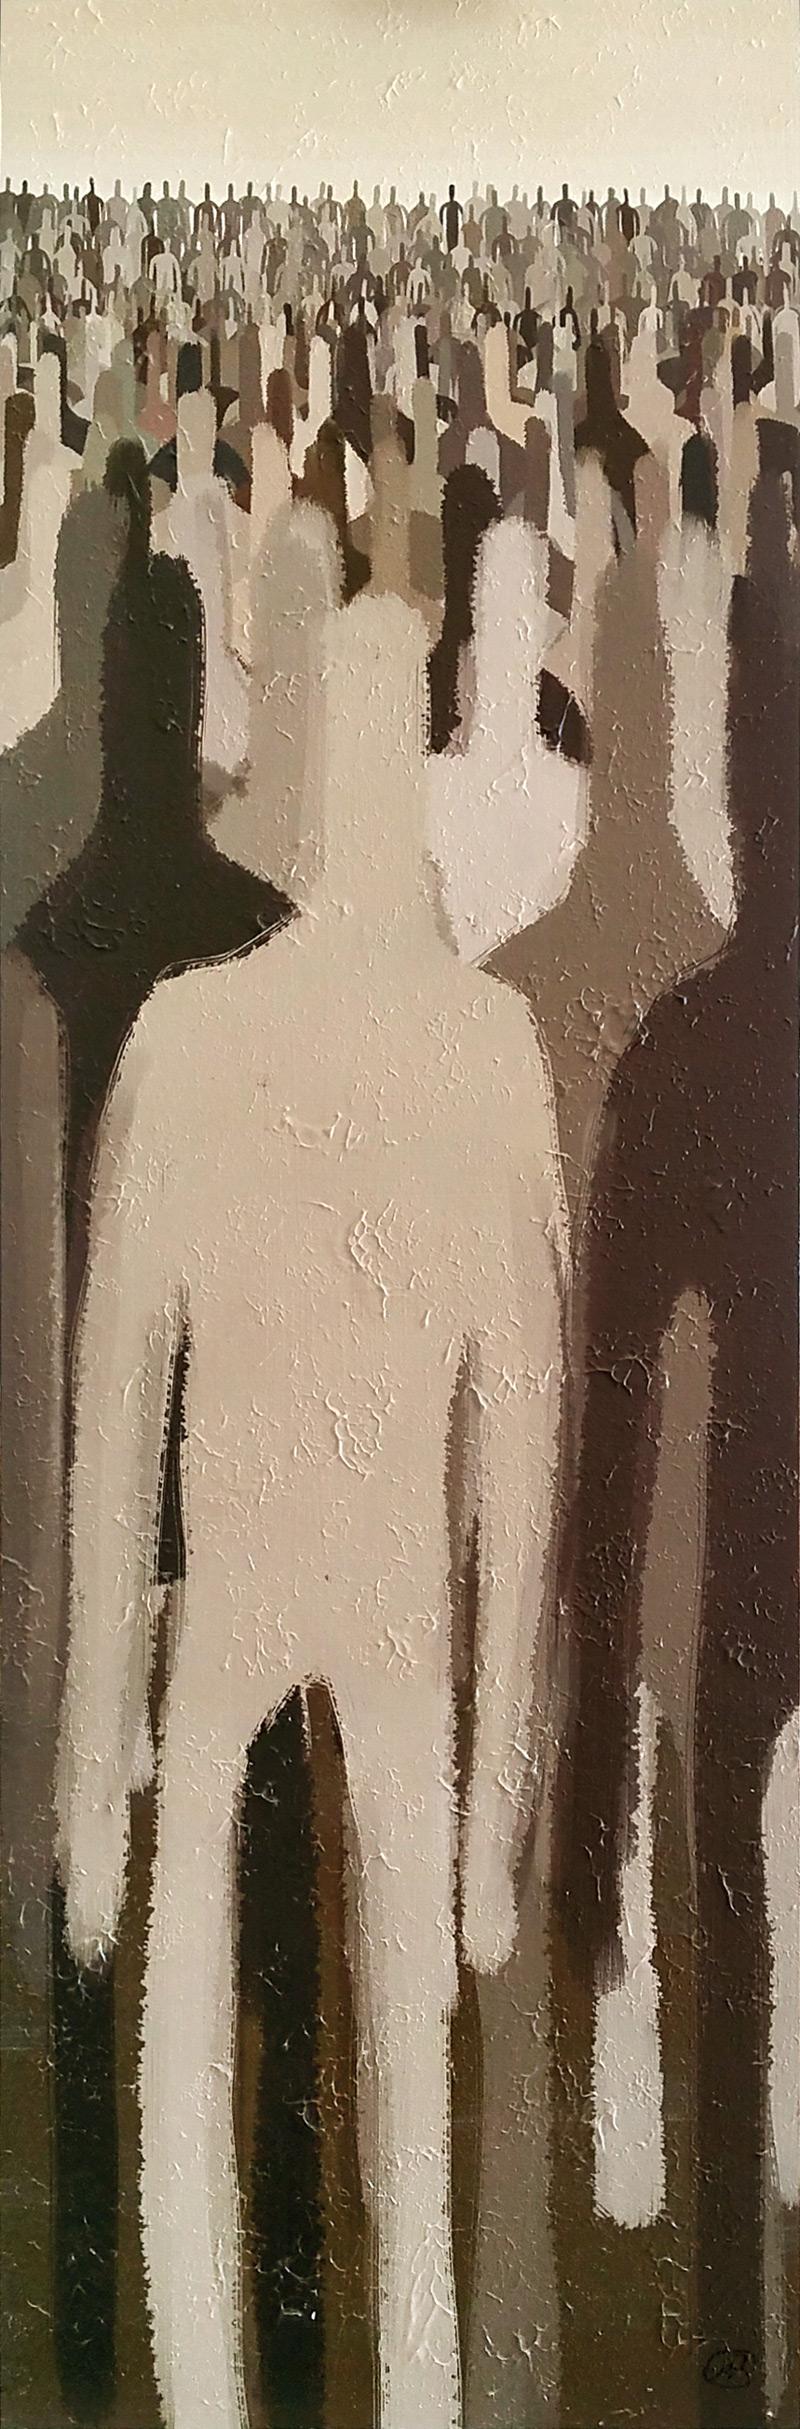 """Sulla massa"", 33x100, 2013"